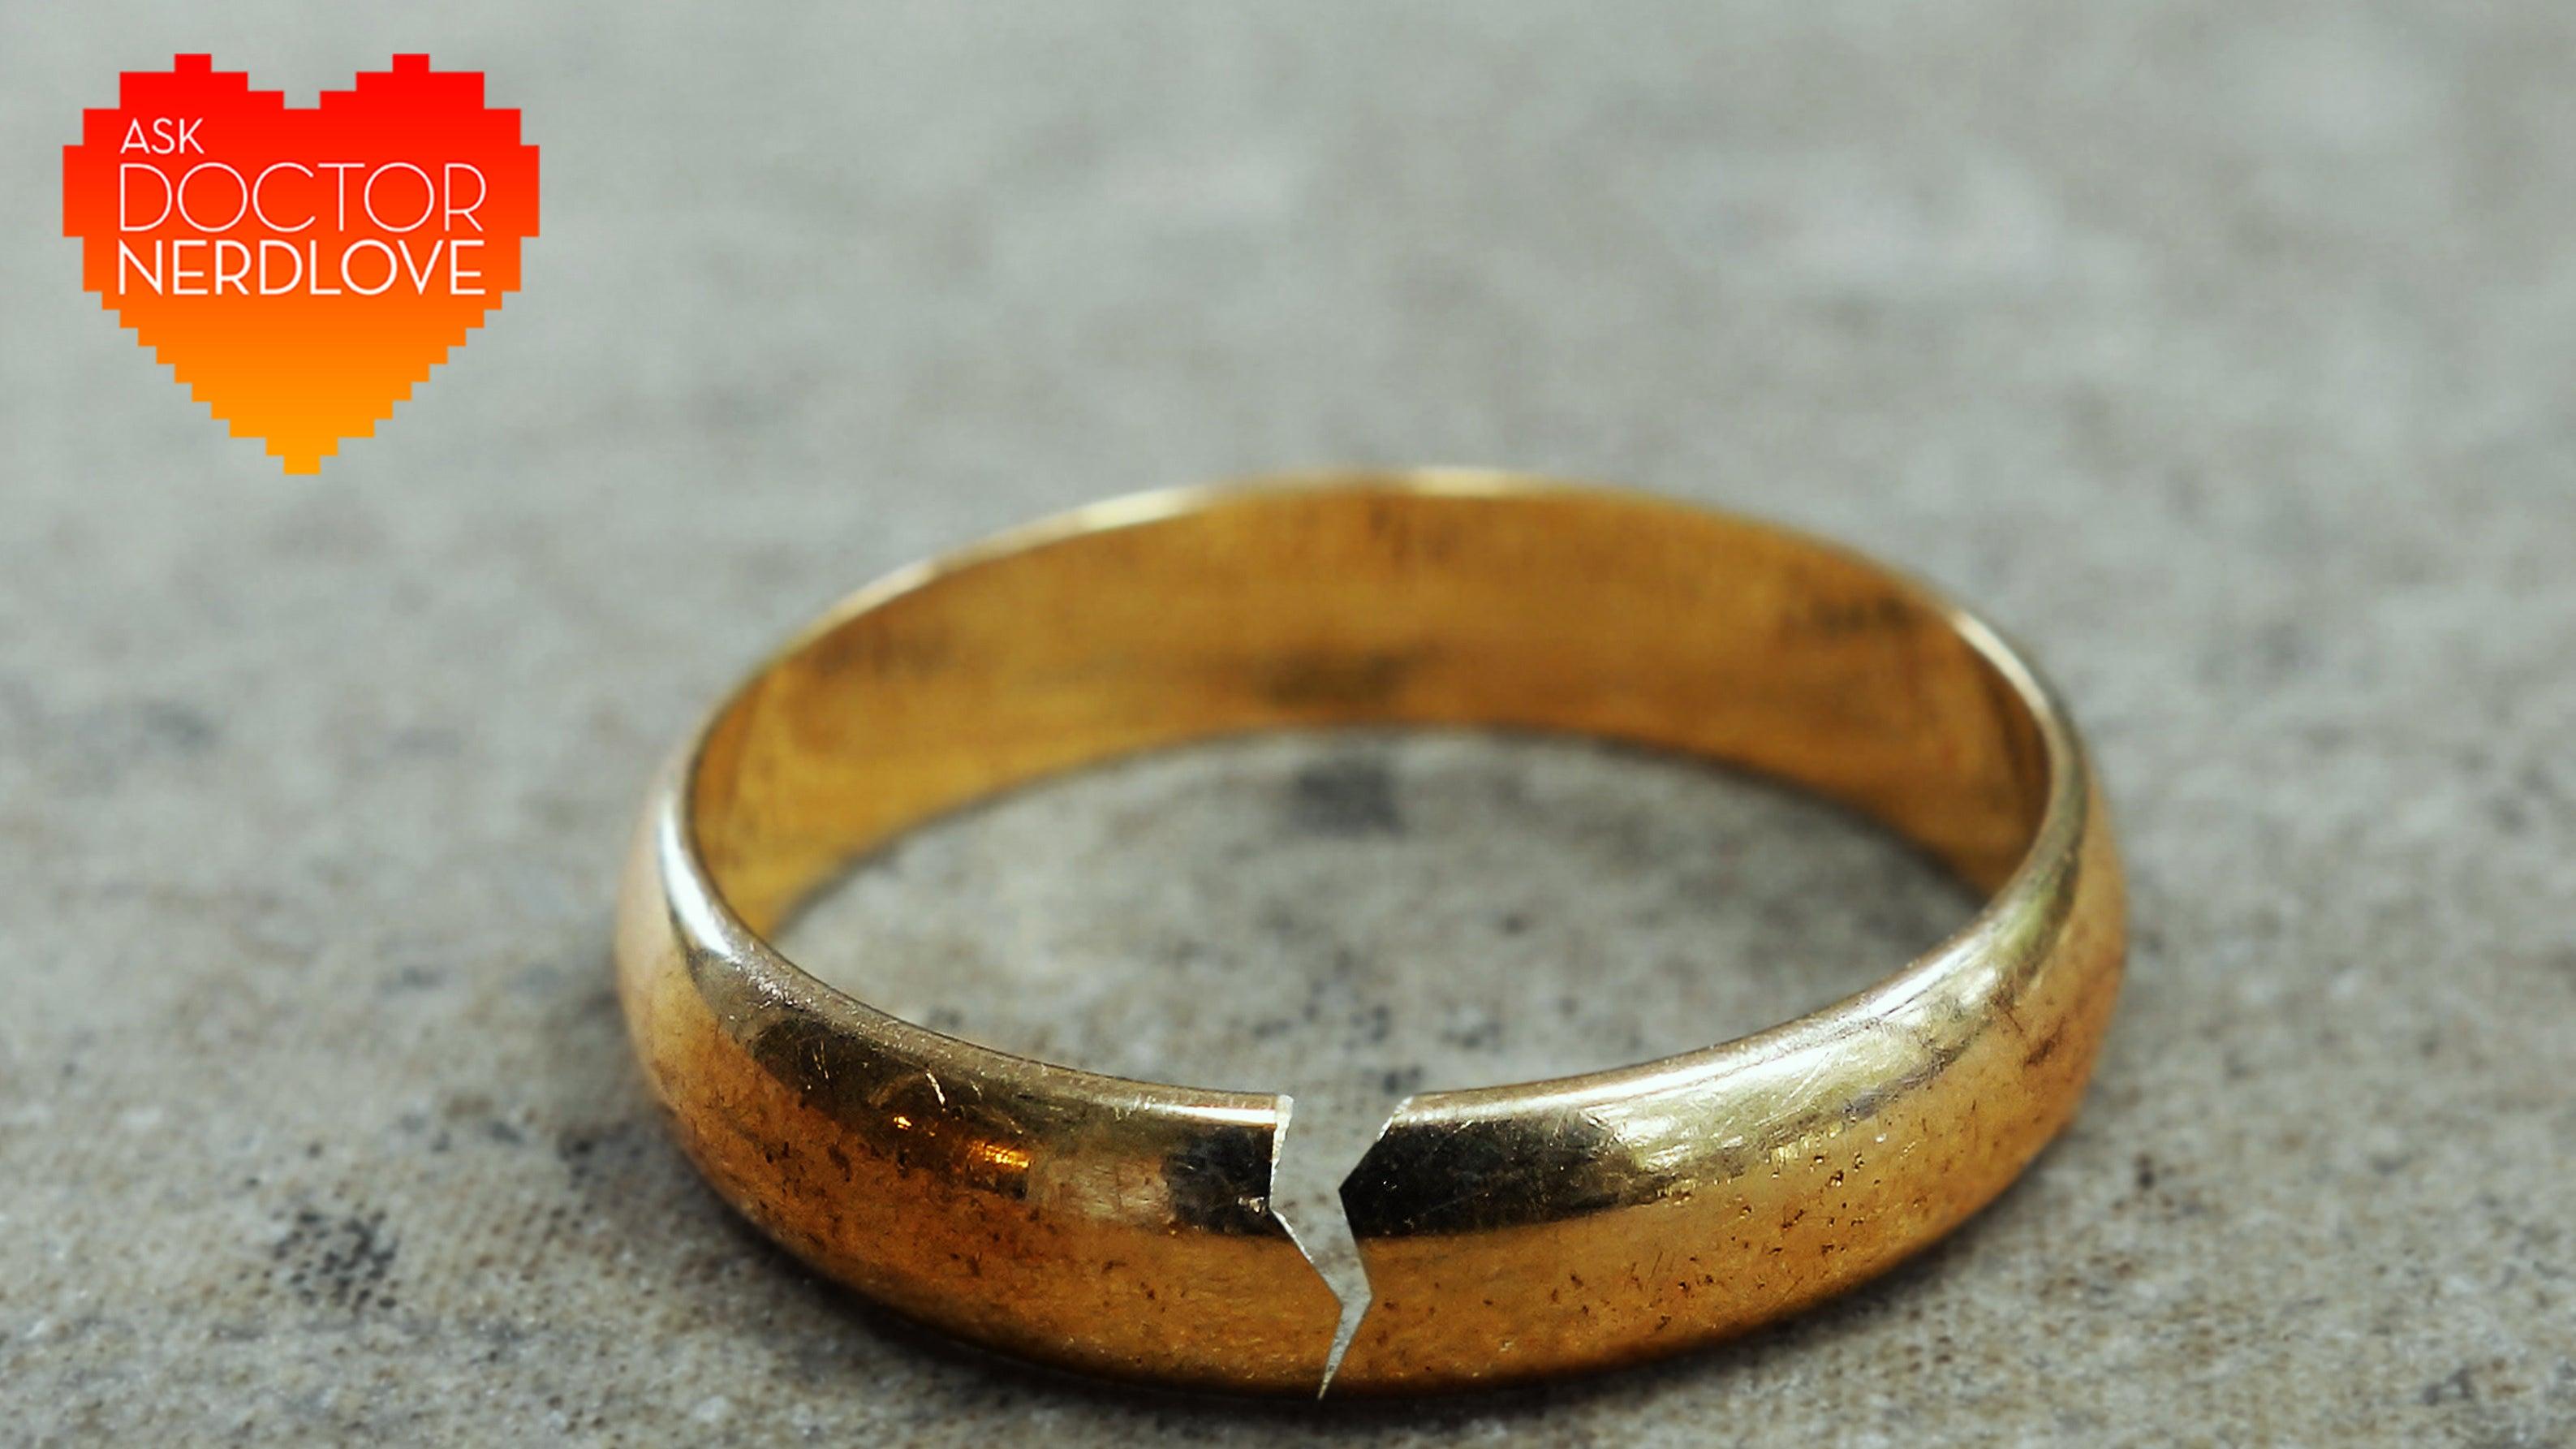 Ask Dr. NerdLove: Help, I Still Love My Ex-Wife!